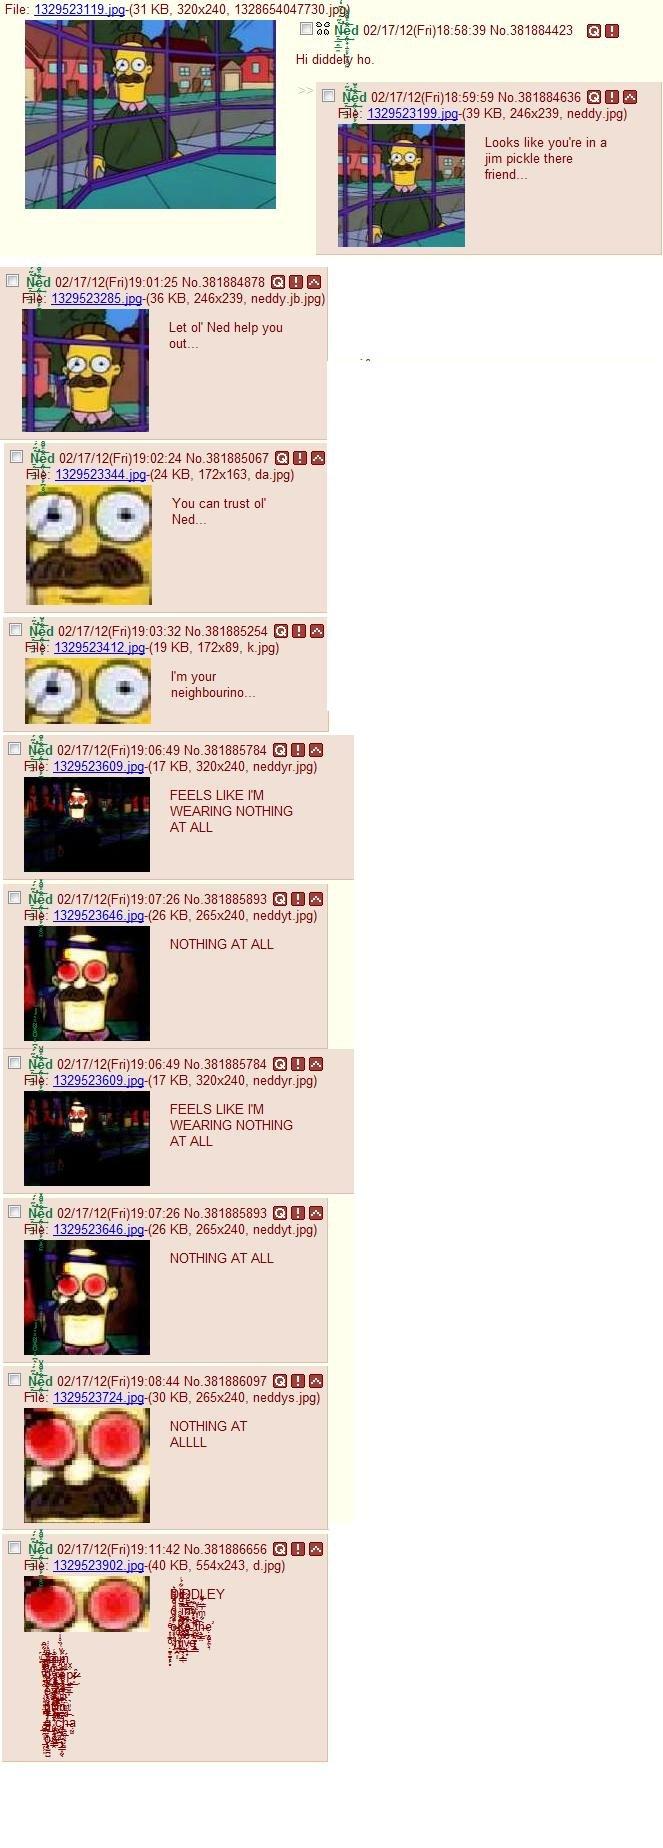 Ned Flanders: Your friendly neighbourino. Courtesy of 4chan.. File: 13295231 -( 31 KB. 320x240, 13286 an M . tii DEE 'iad (/ / efil( Fri) 18: No/ 381884423 an H